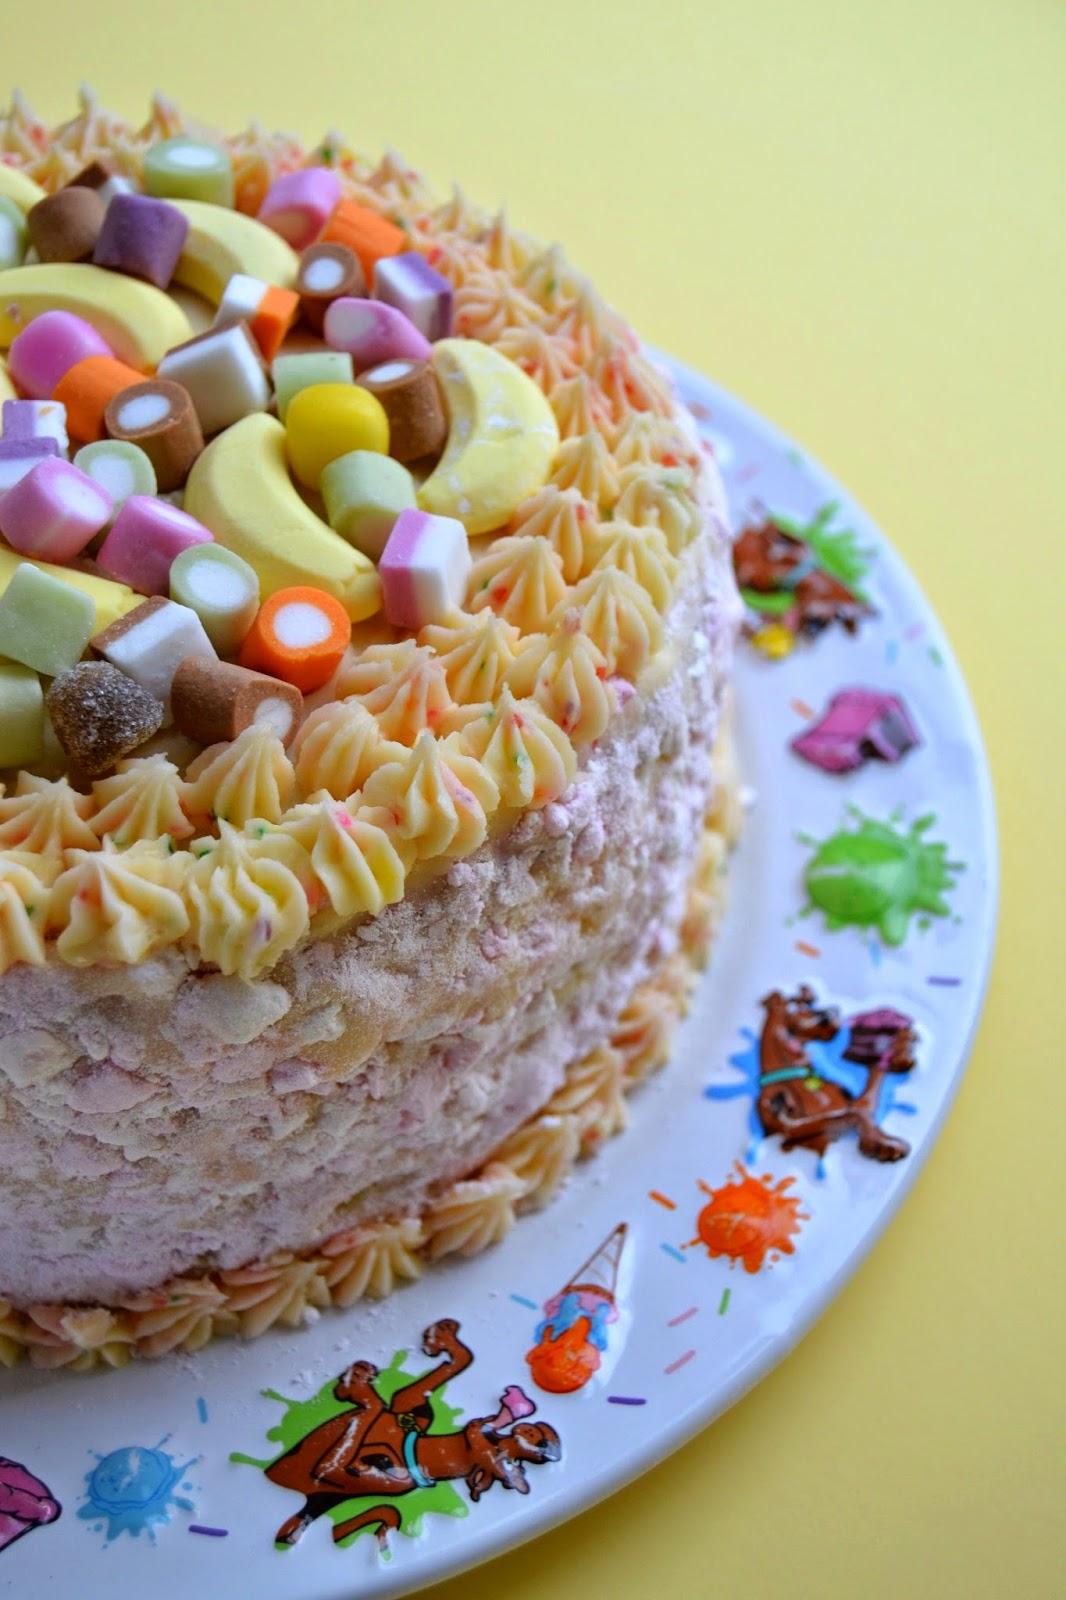 Cakeyboi clandestine cake club dundee may 2014 publicscrutiny Images